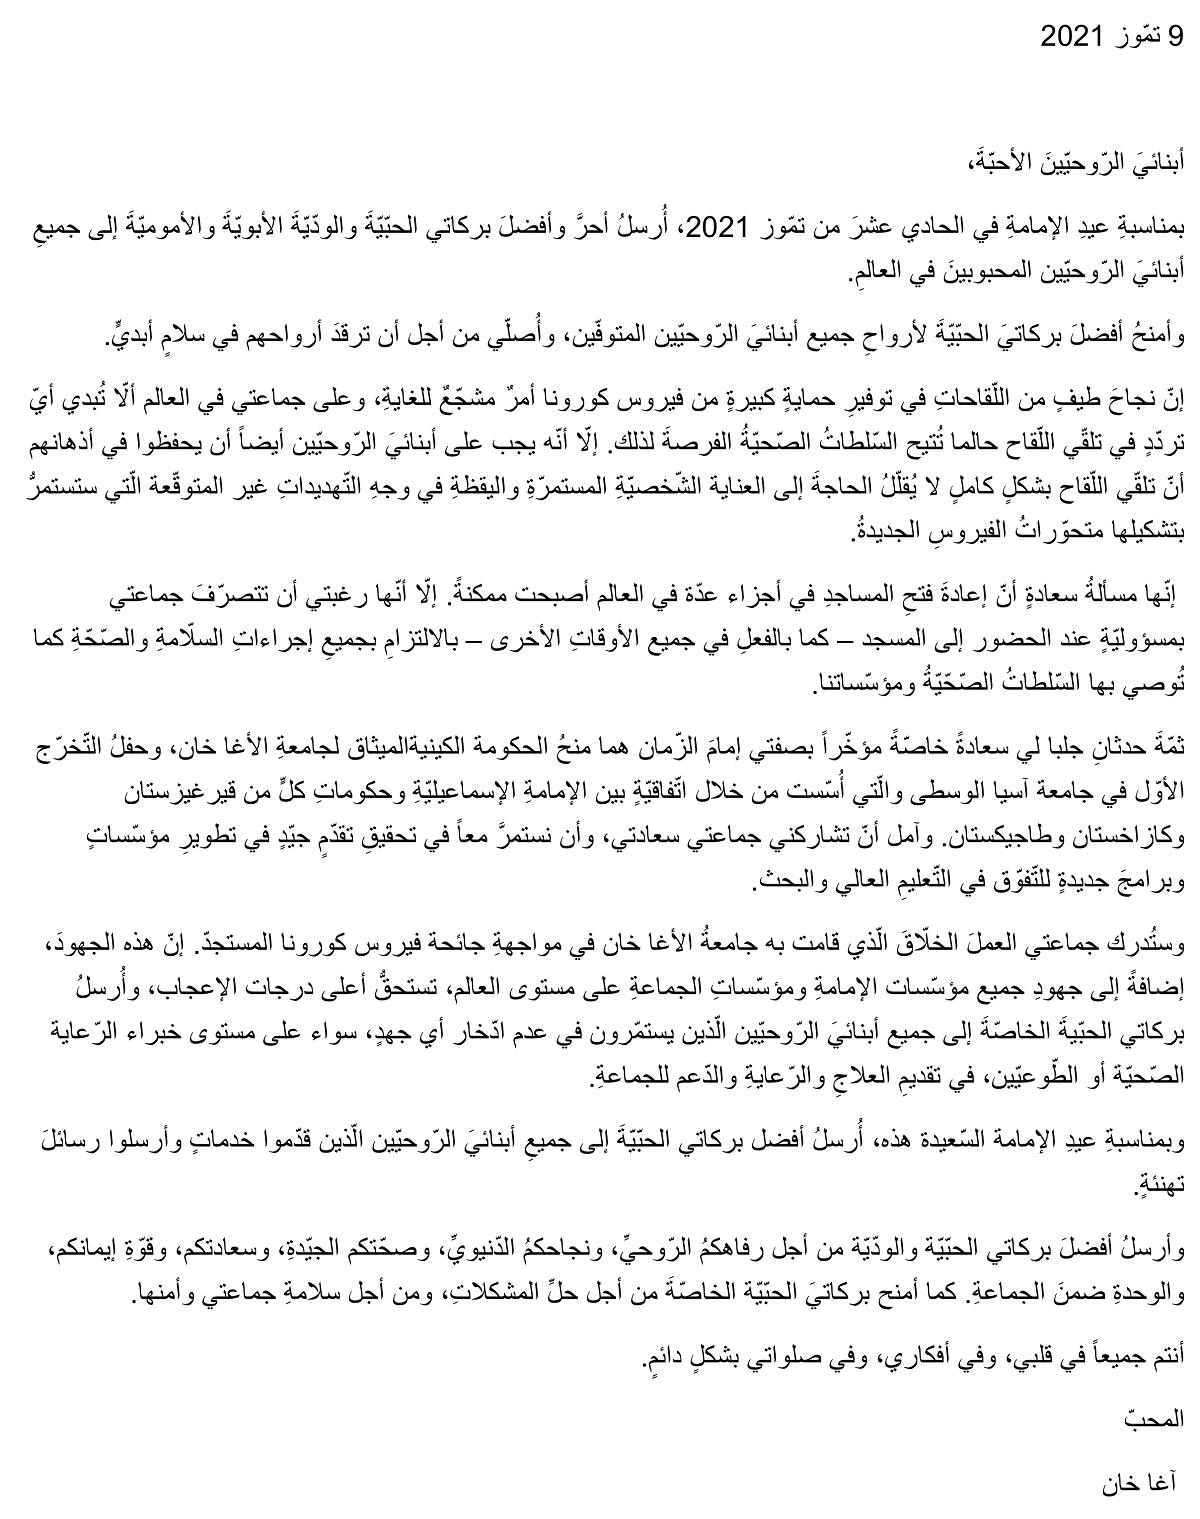 Aga Khan Message Imamat Day 2021 in Farsi